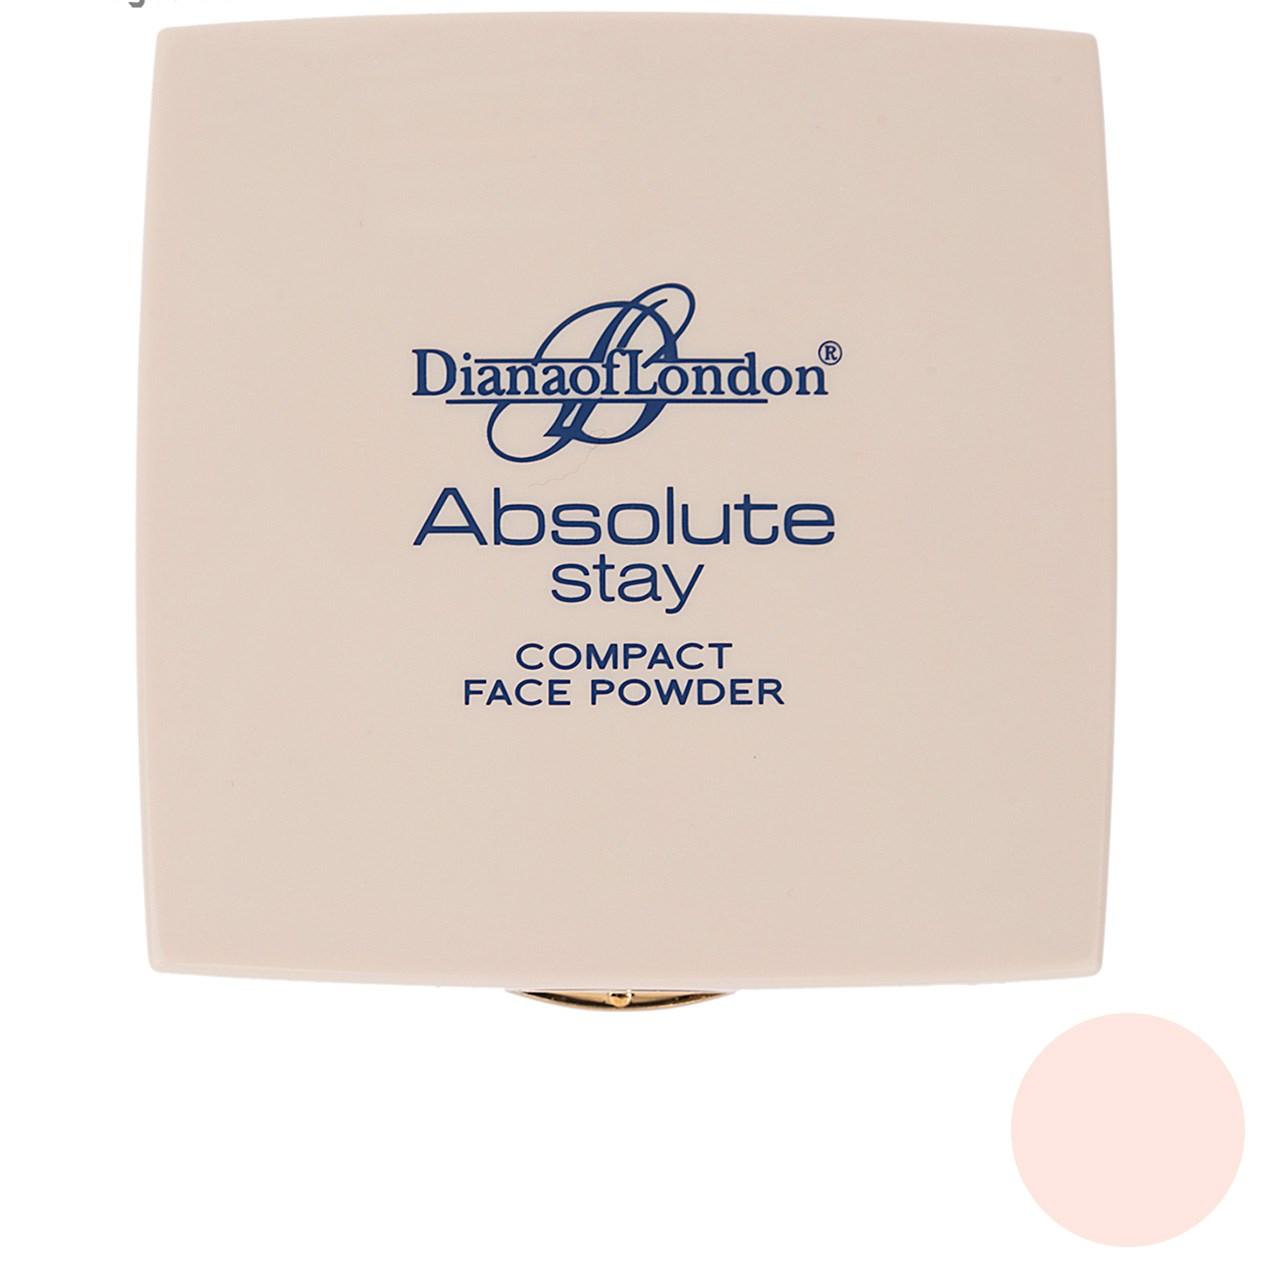 پنکیک دایانا آف لاندن سری Absolute Stay مدل Pure Rose شماره 403